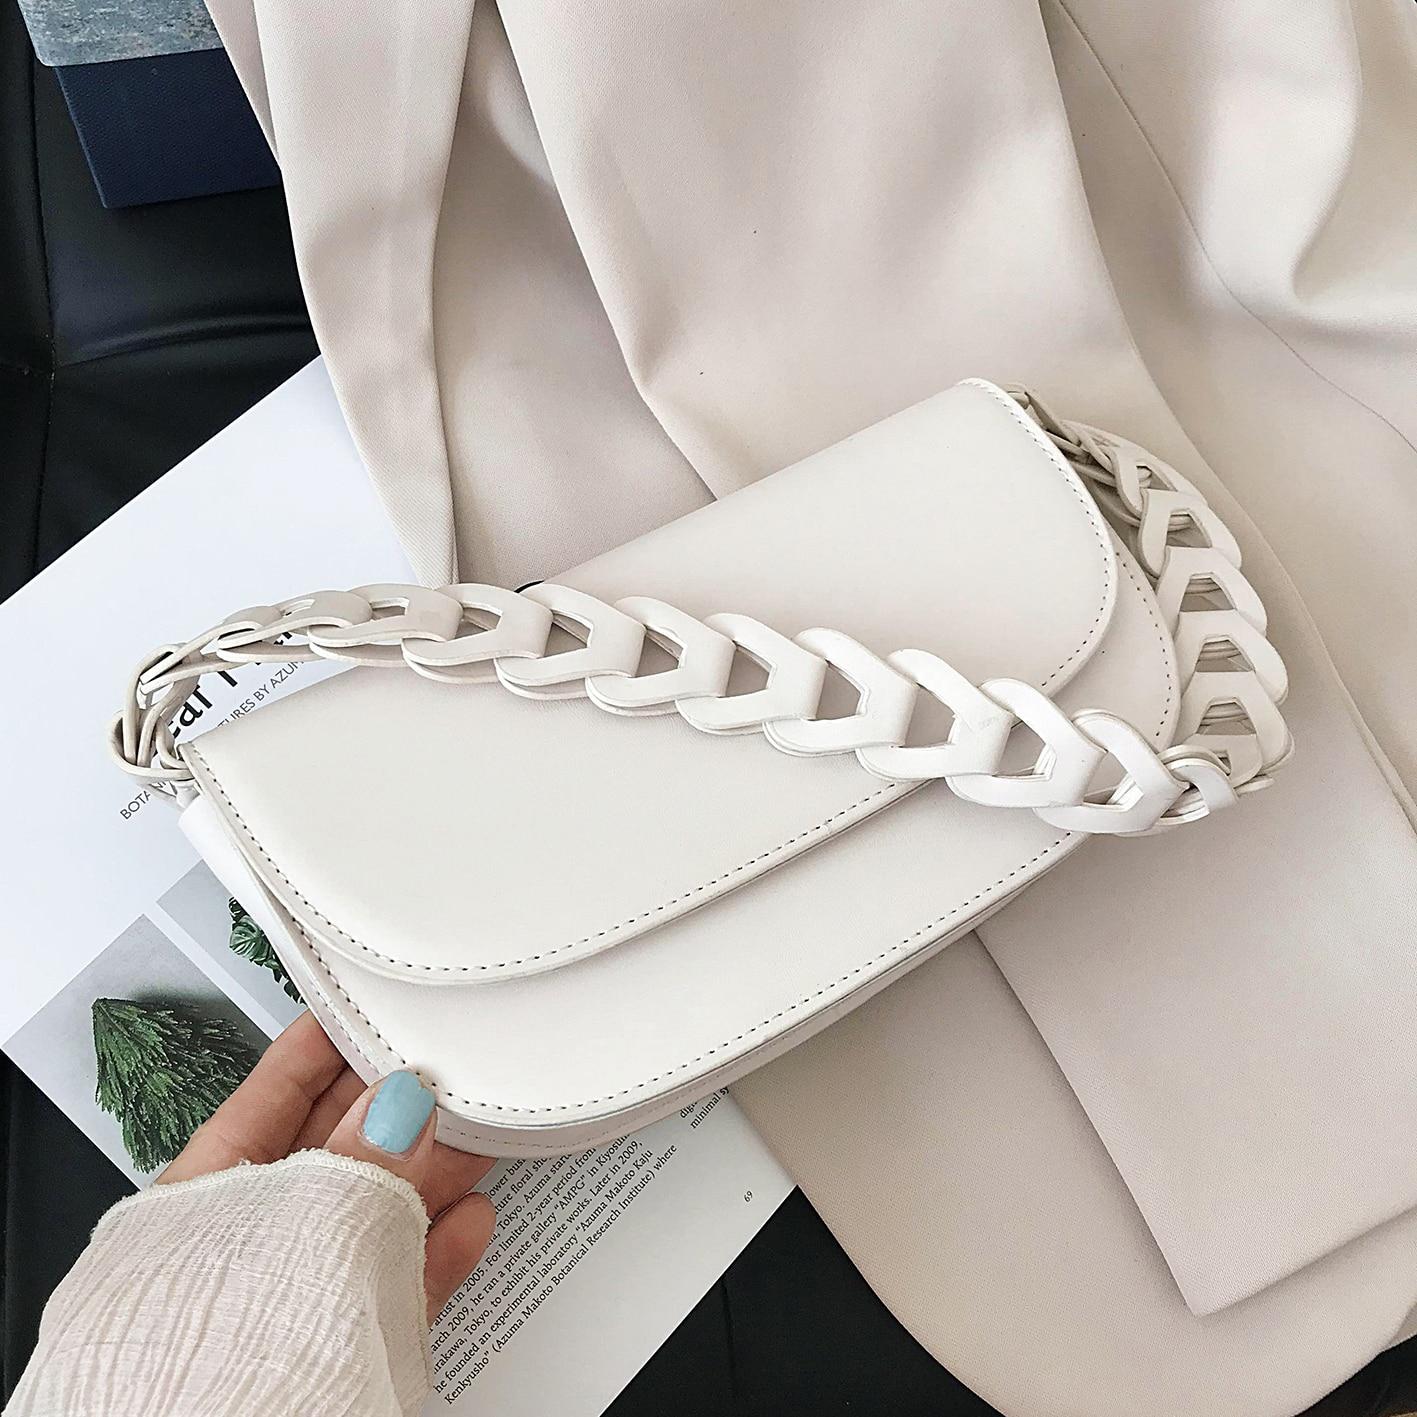 Weave Shoulder Belt PU Leather Crossbody Bags For Women 2020 Elegant Small Shoulder Handbags Female Travel Cross Body Bag